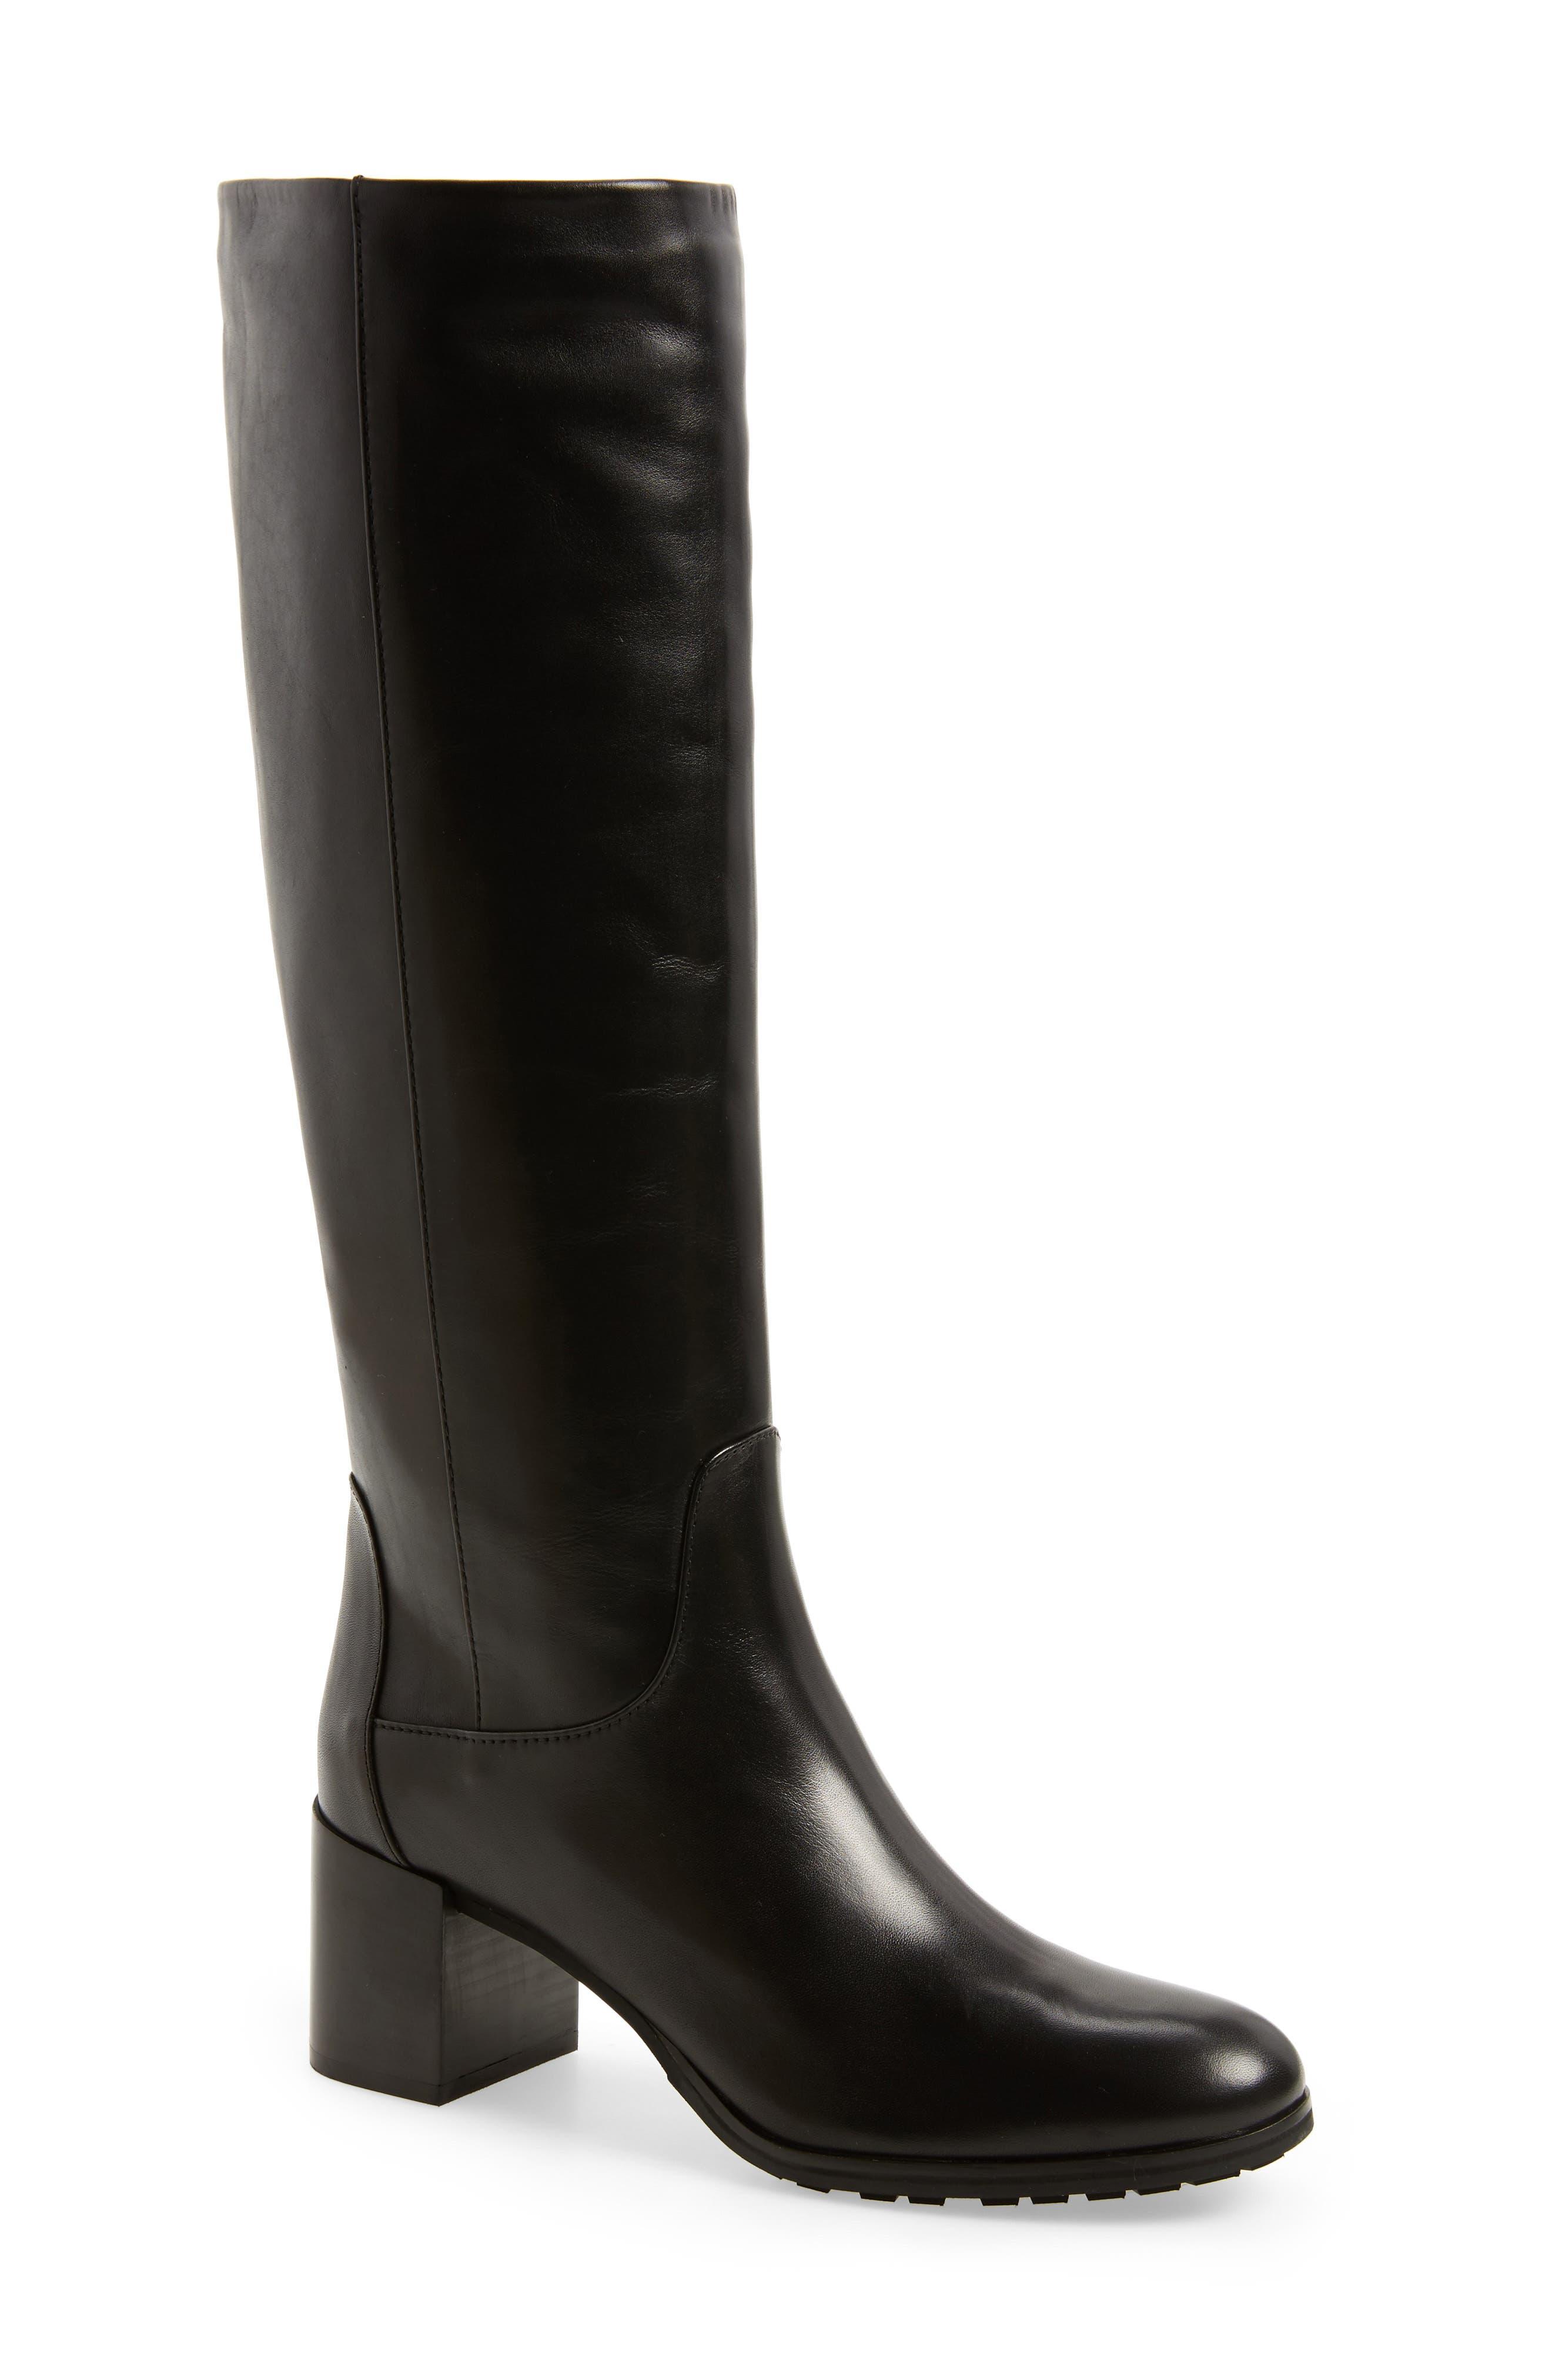 Alternate Image 1 Selected - Aquatalia Evelin Weatherproof Knee High Boot (Women)